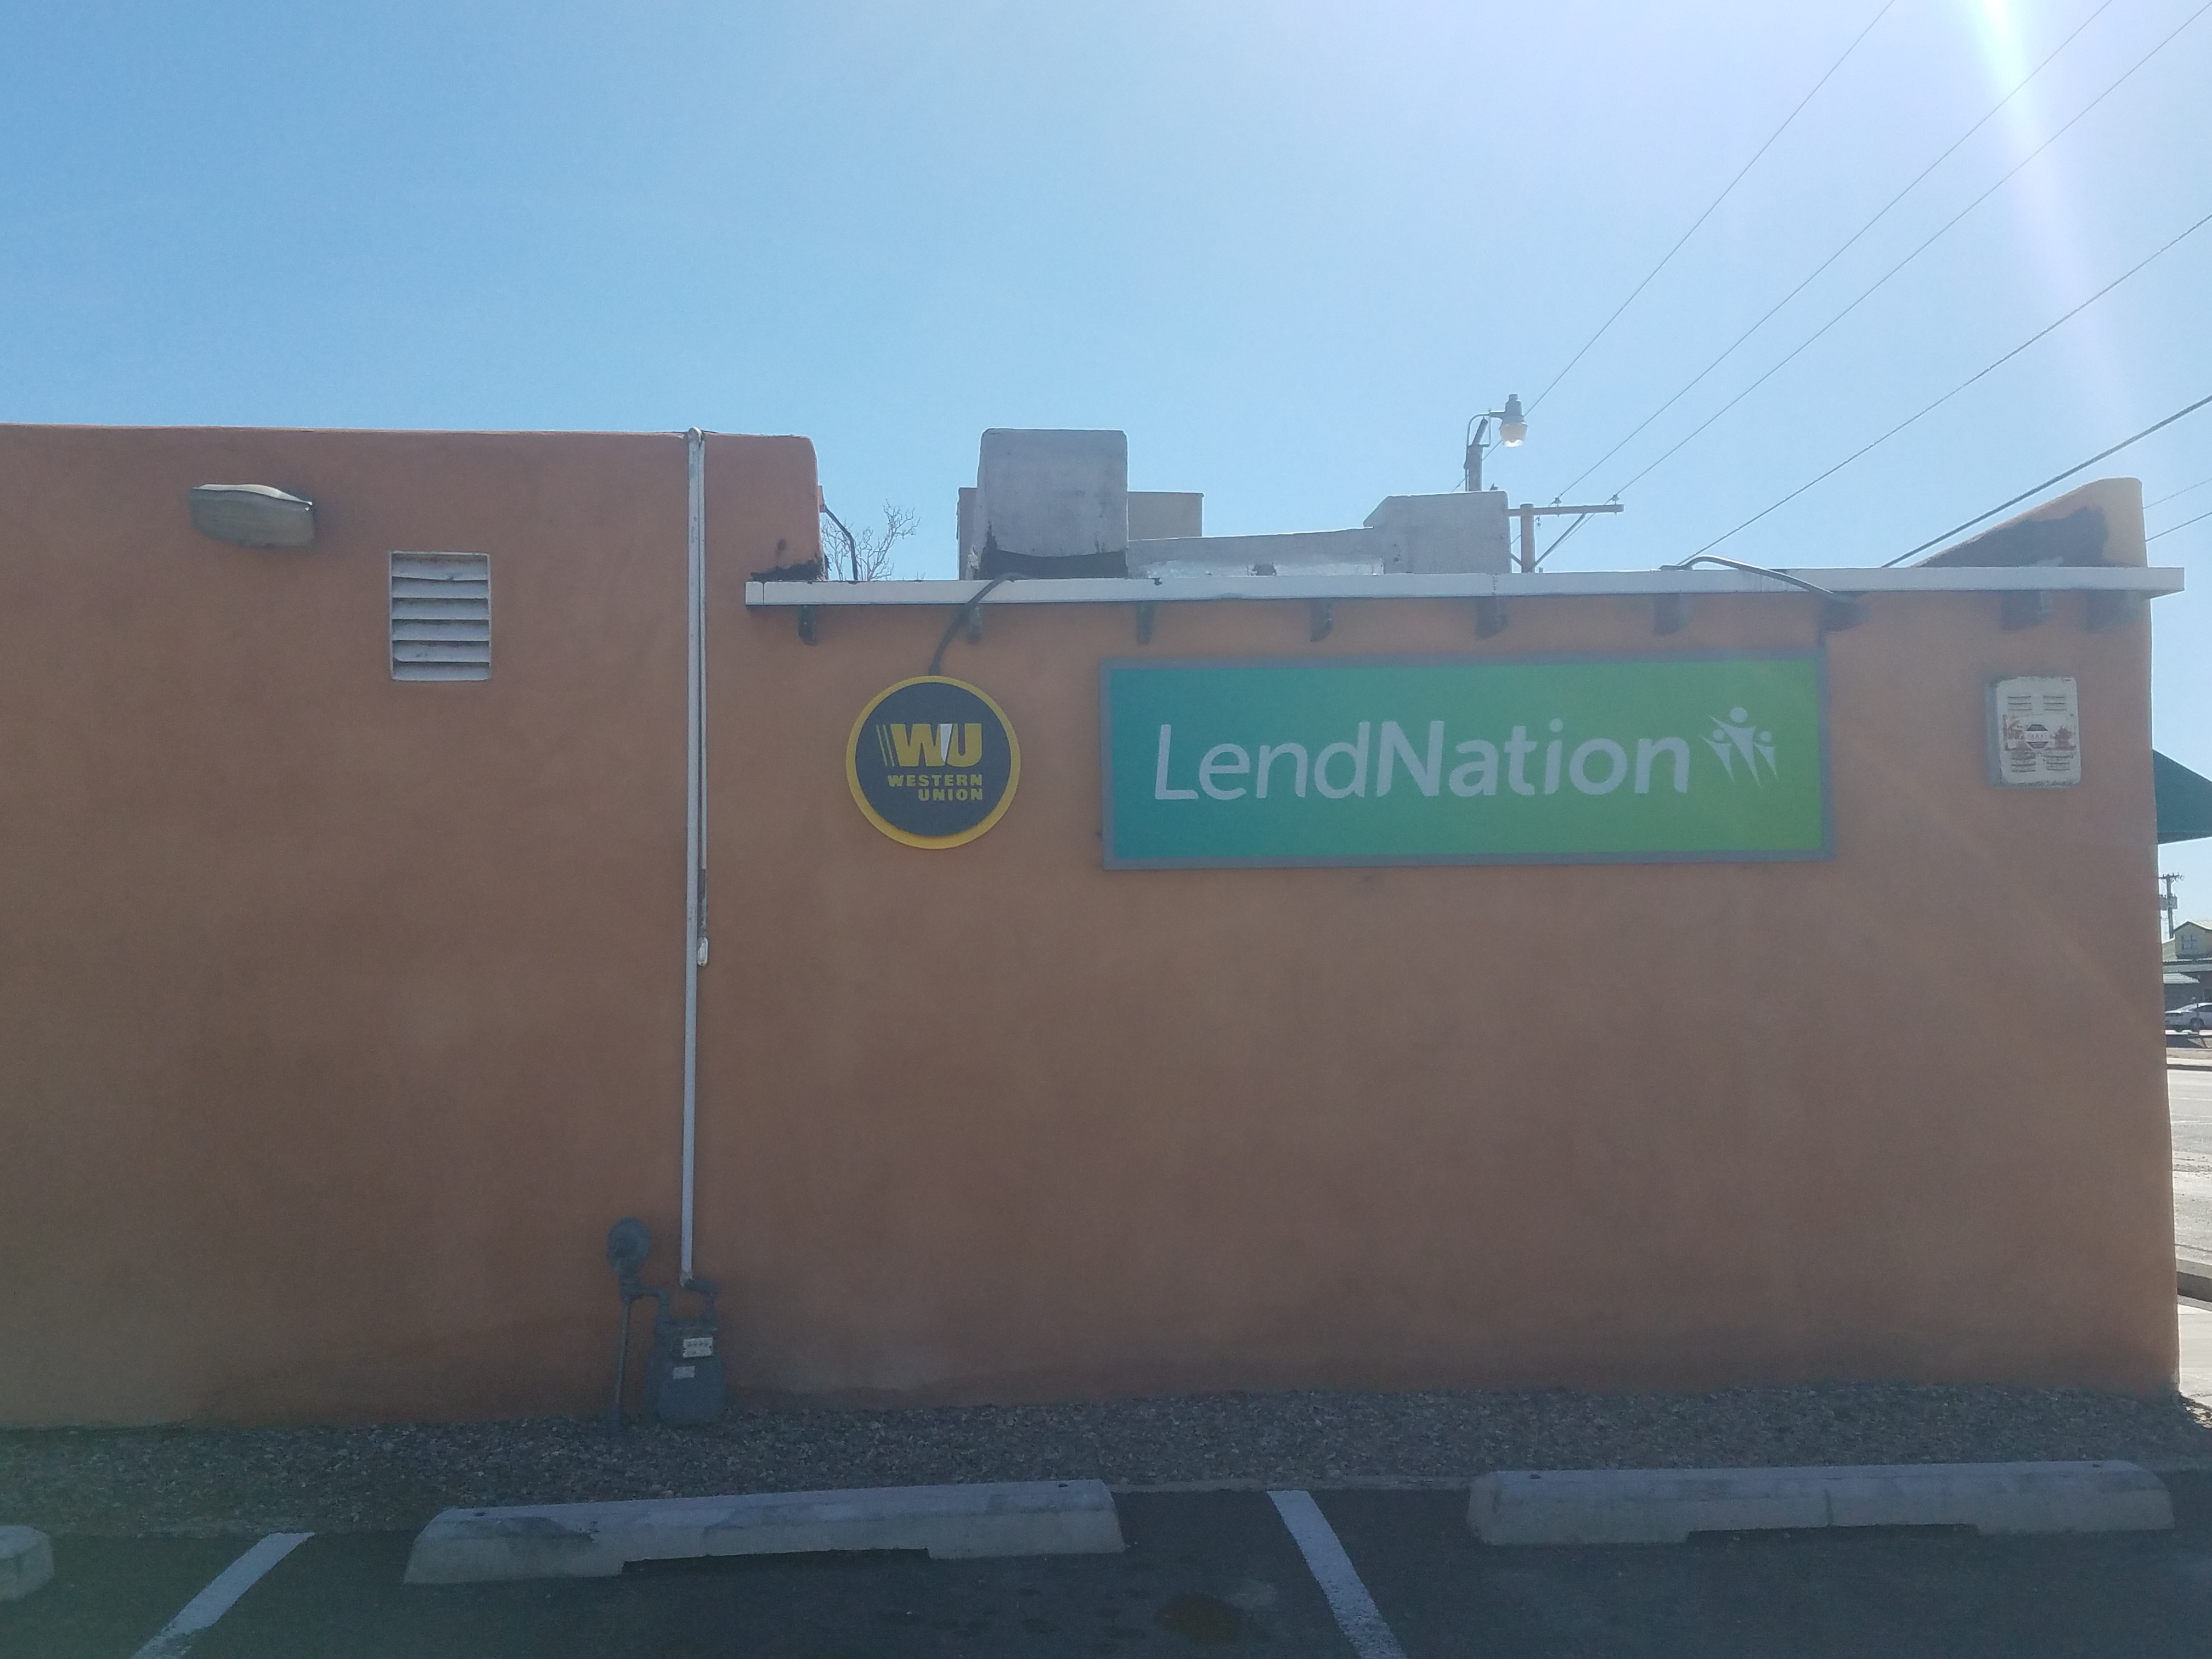 LendNation image 1